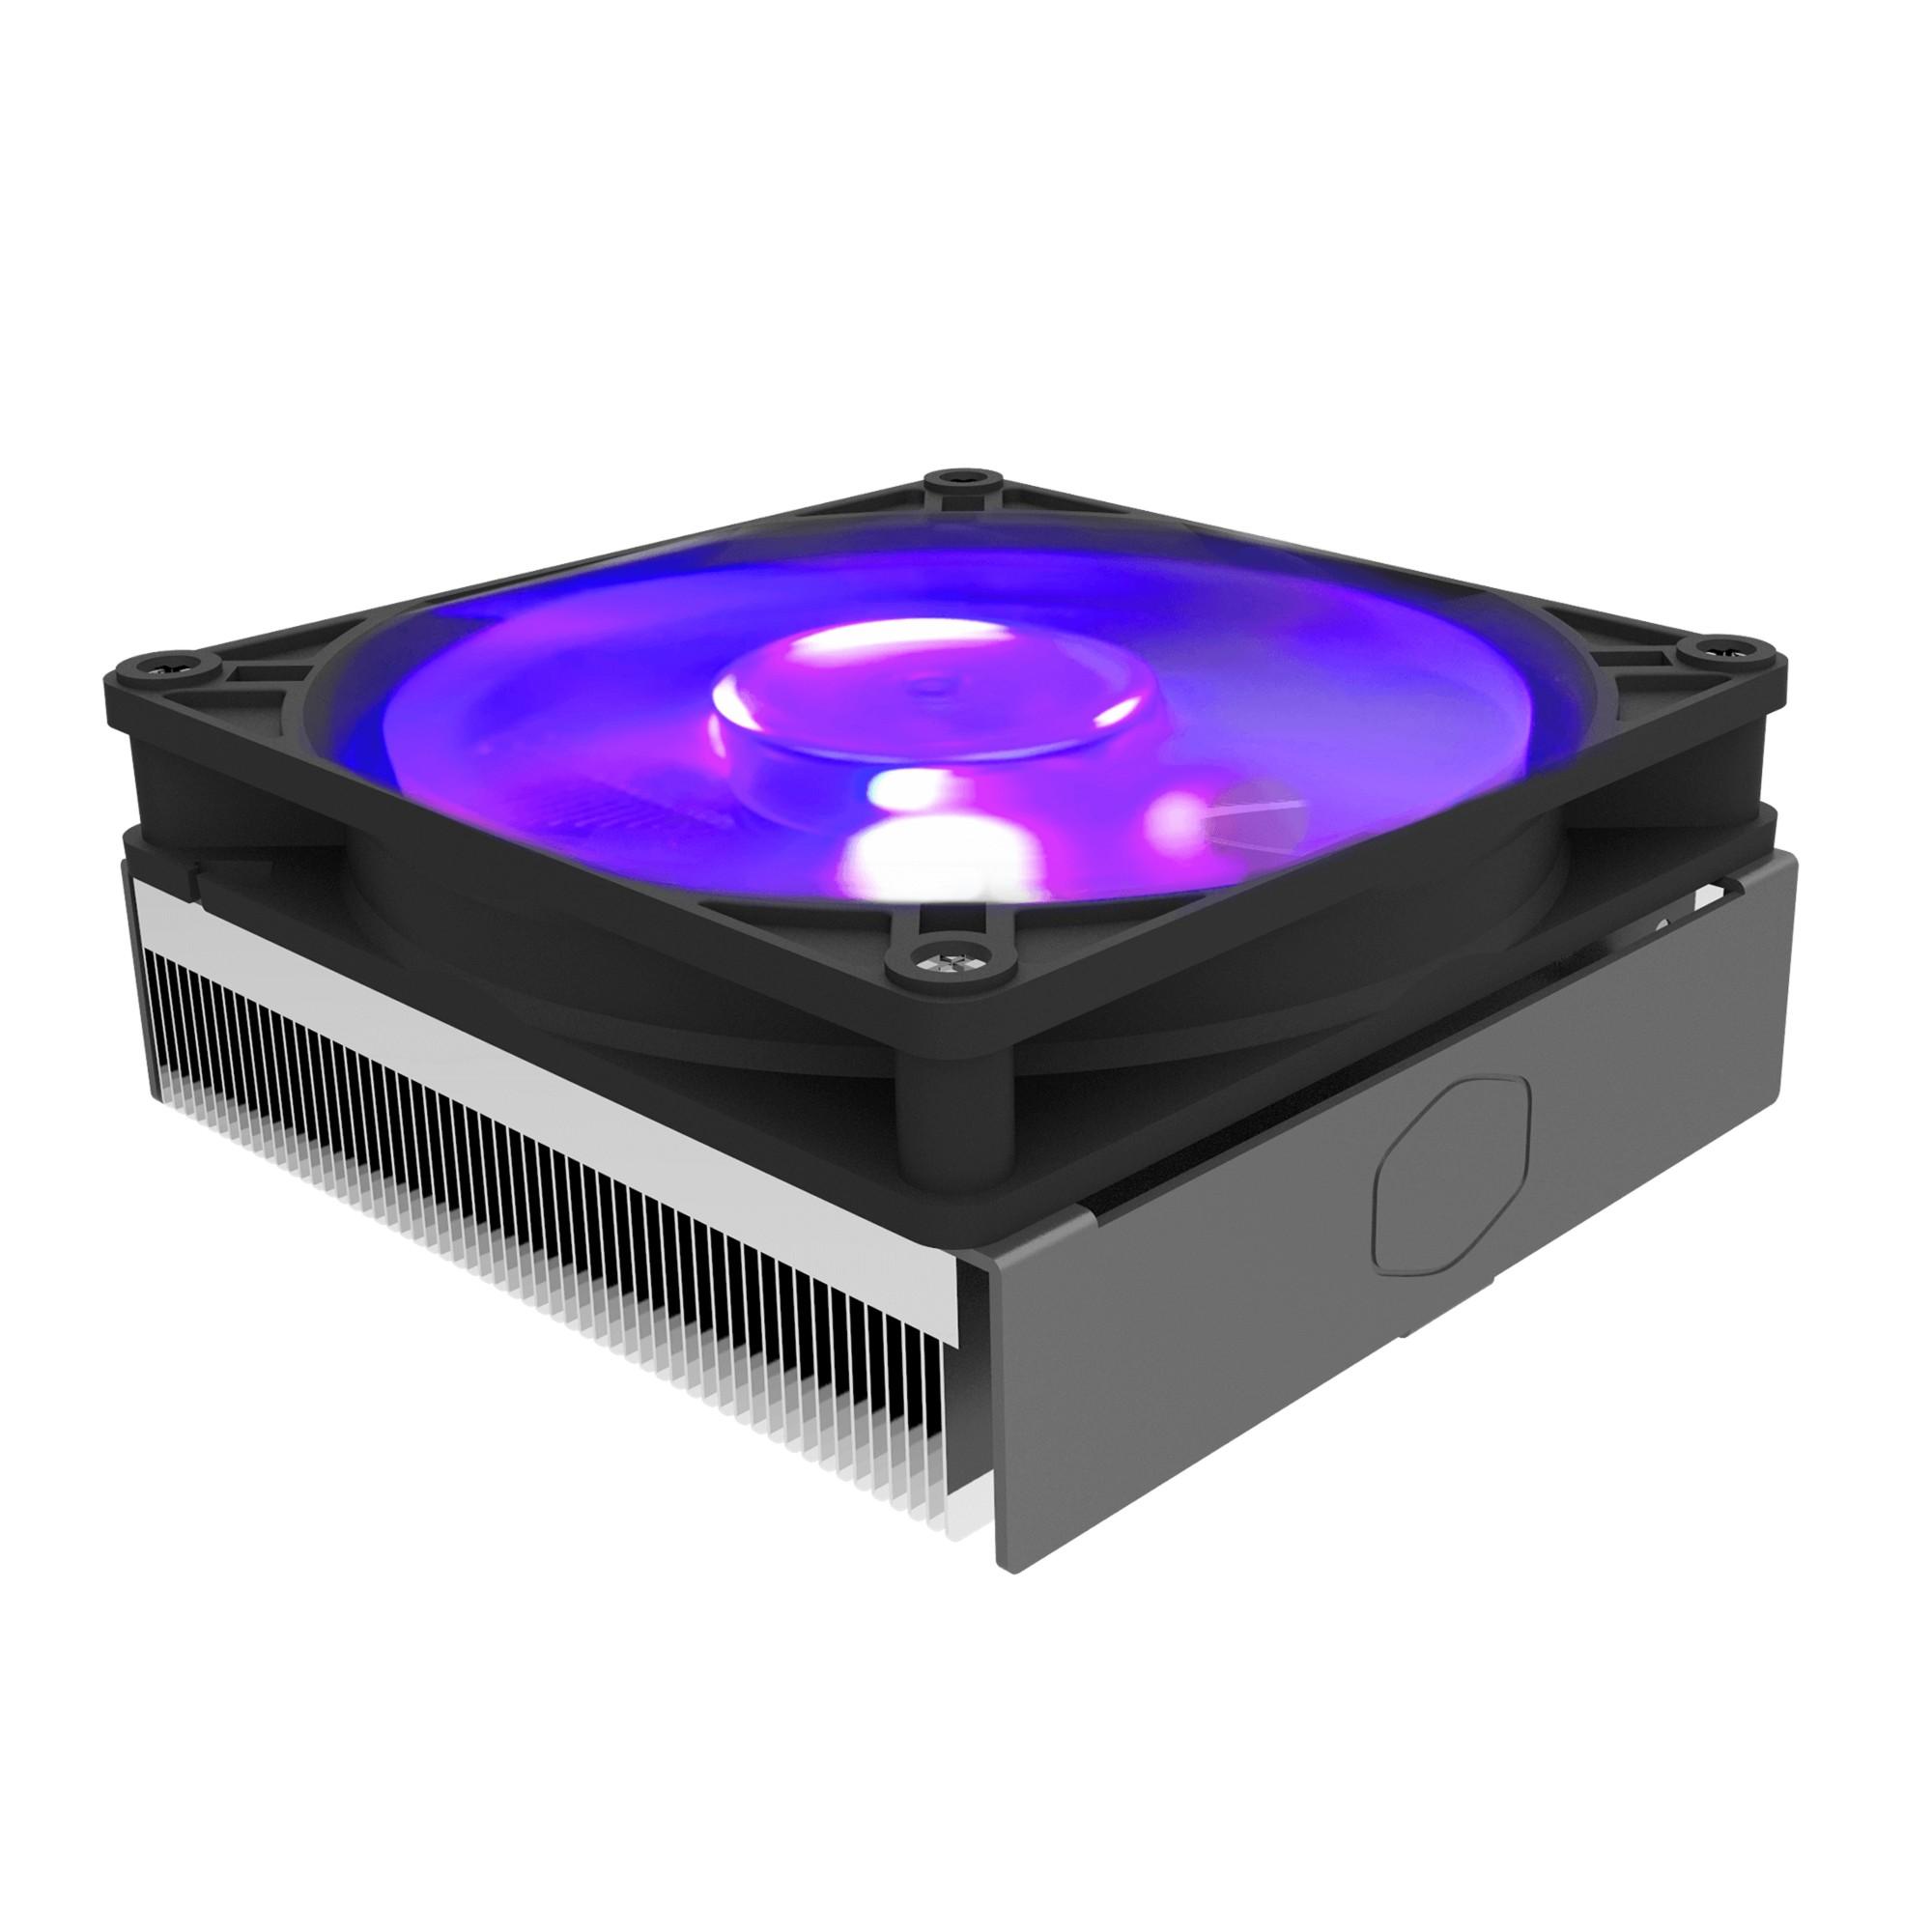 Cooler Master MasterAir G200P Processor